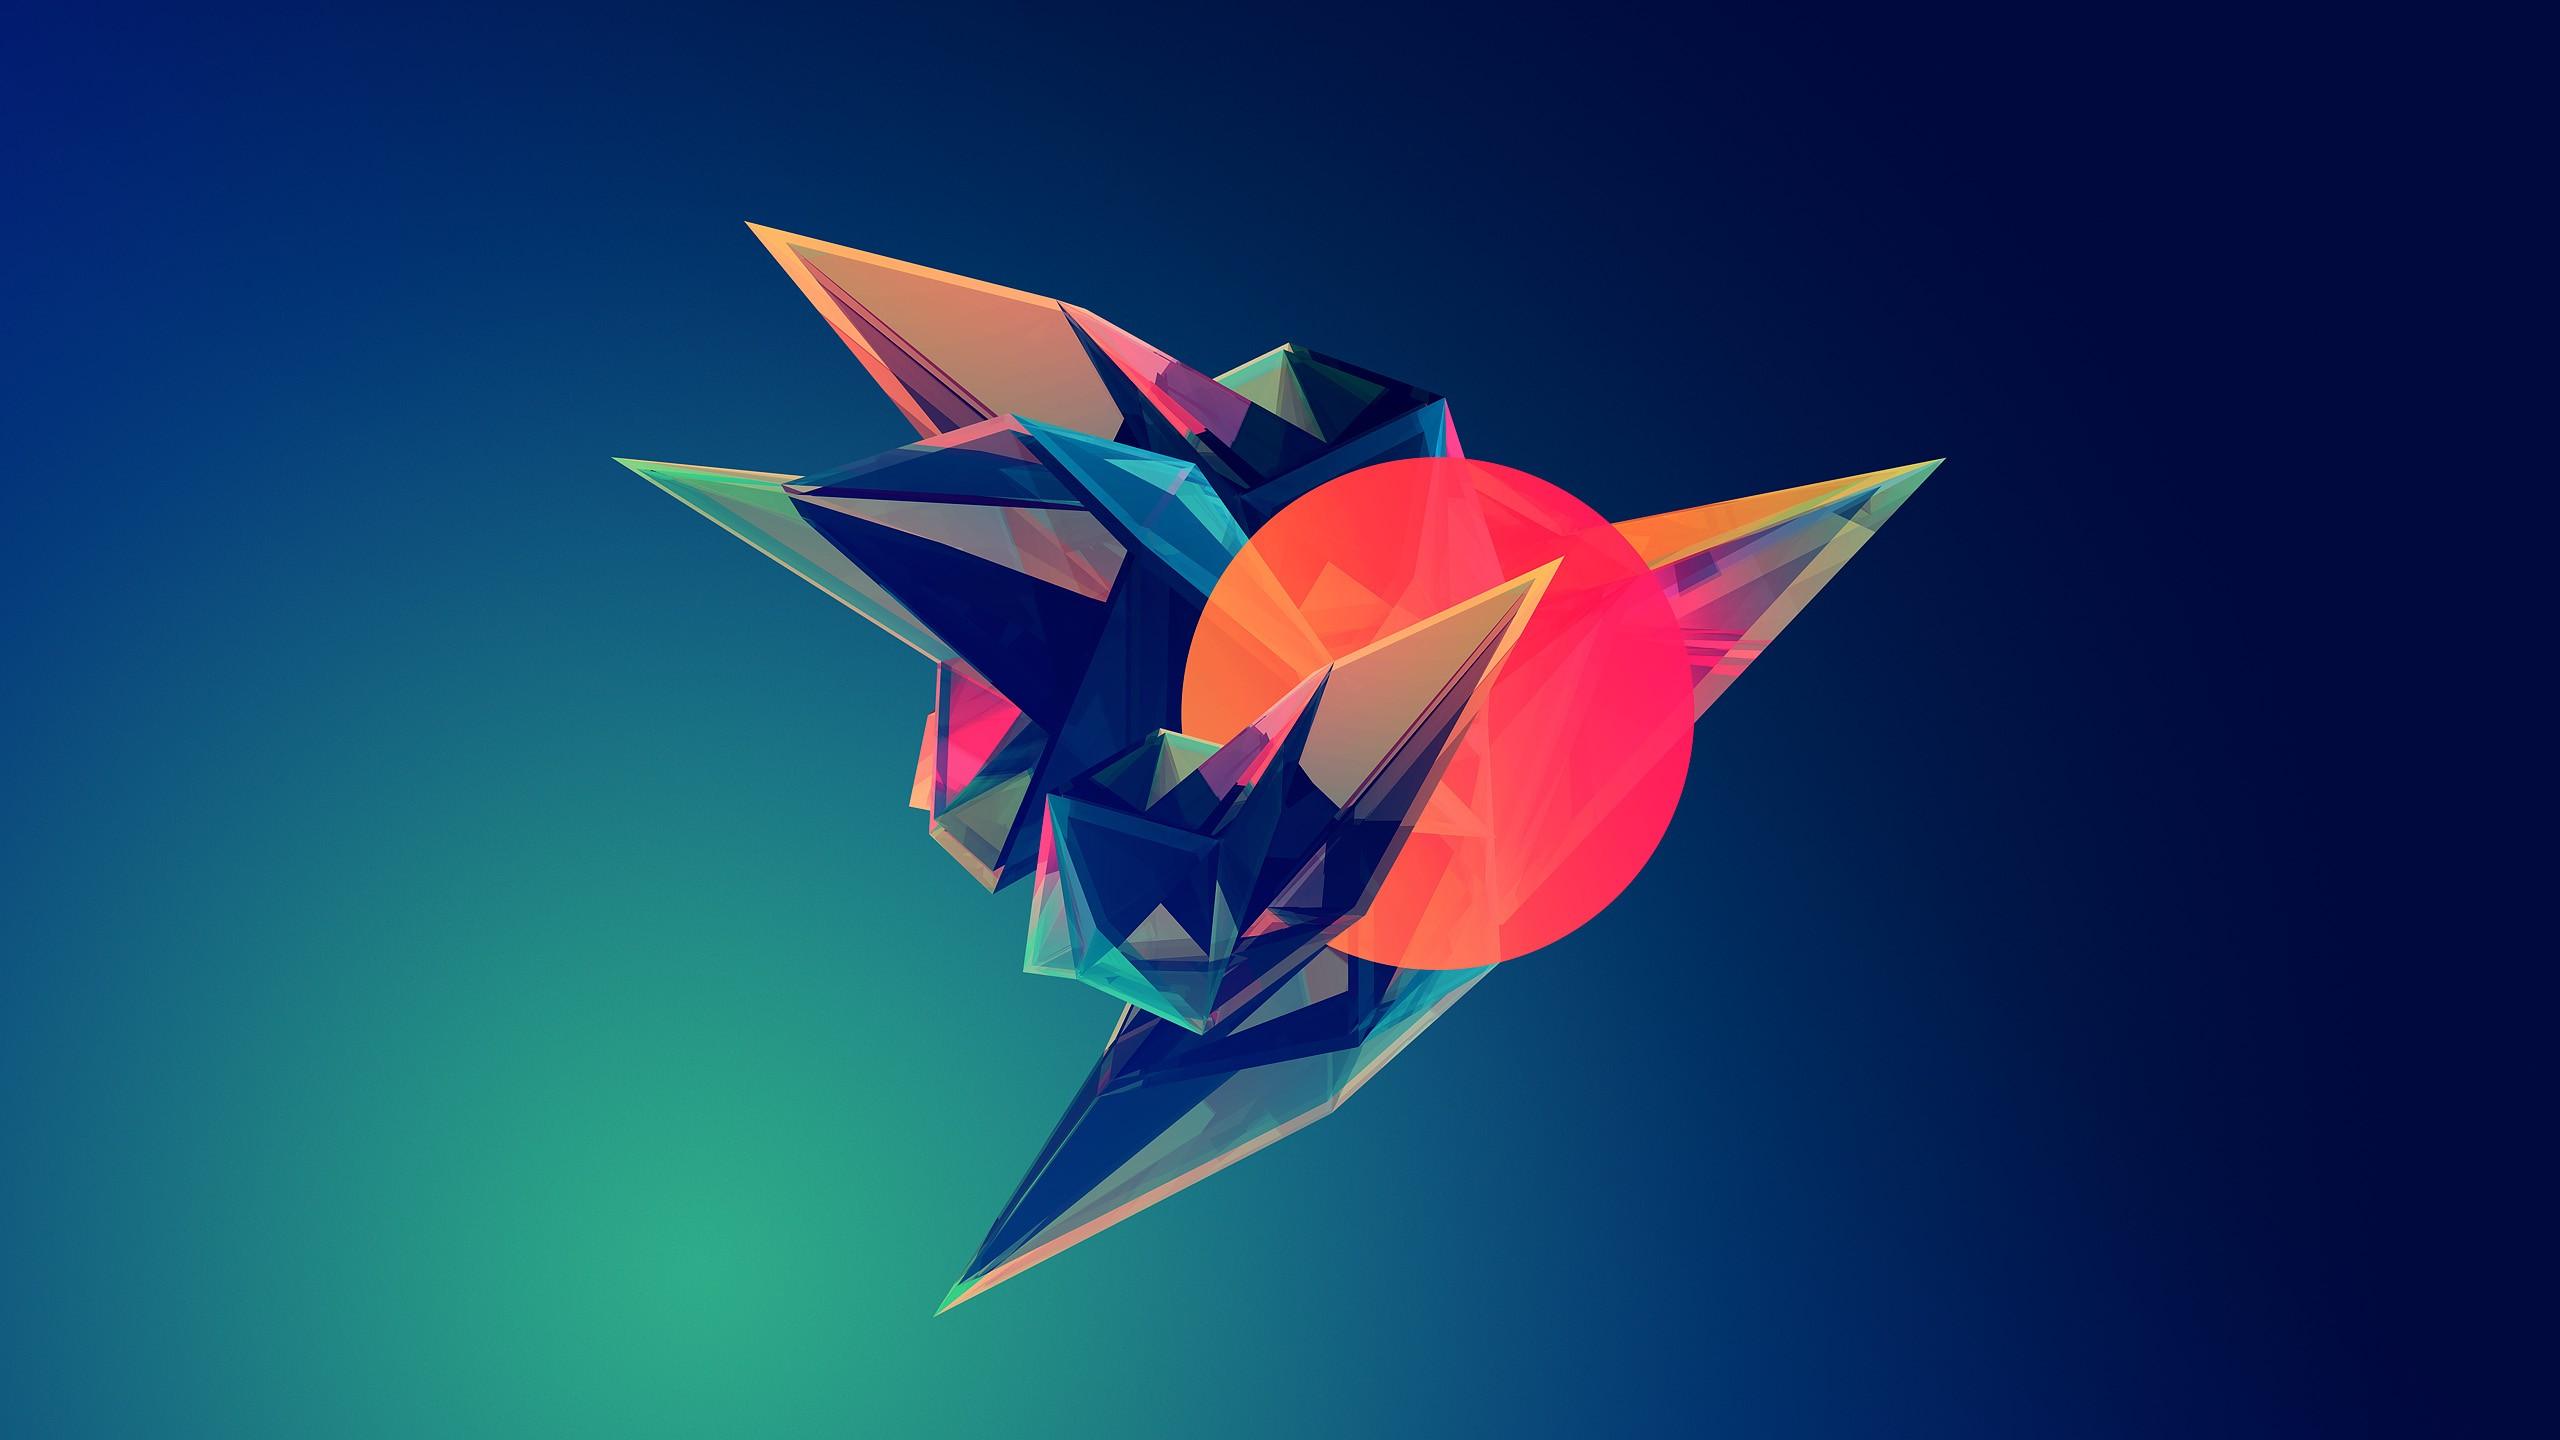 Geometric Desktop Wallpaper 2560x1440